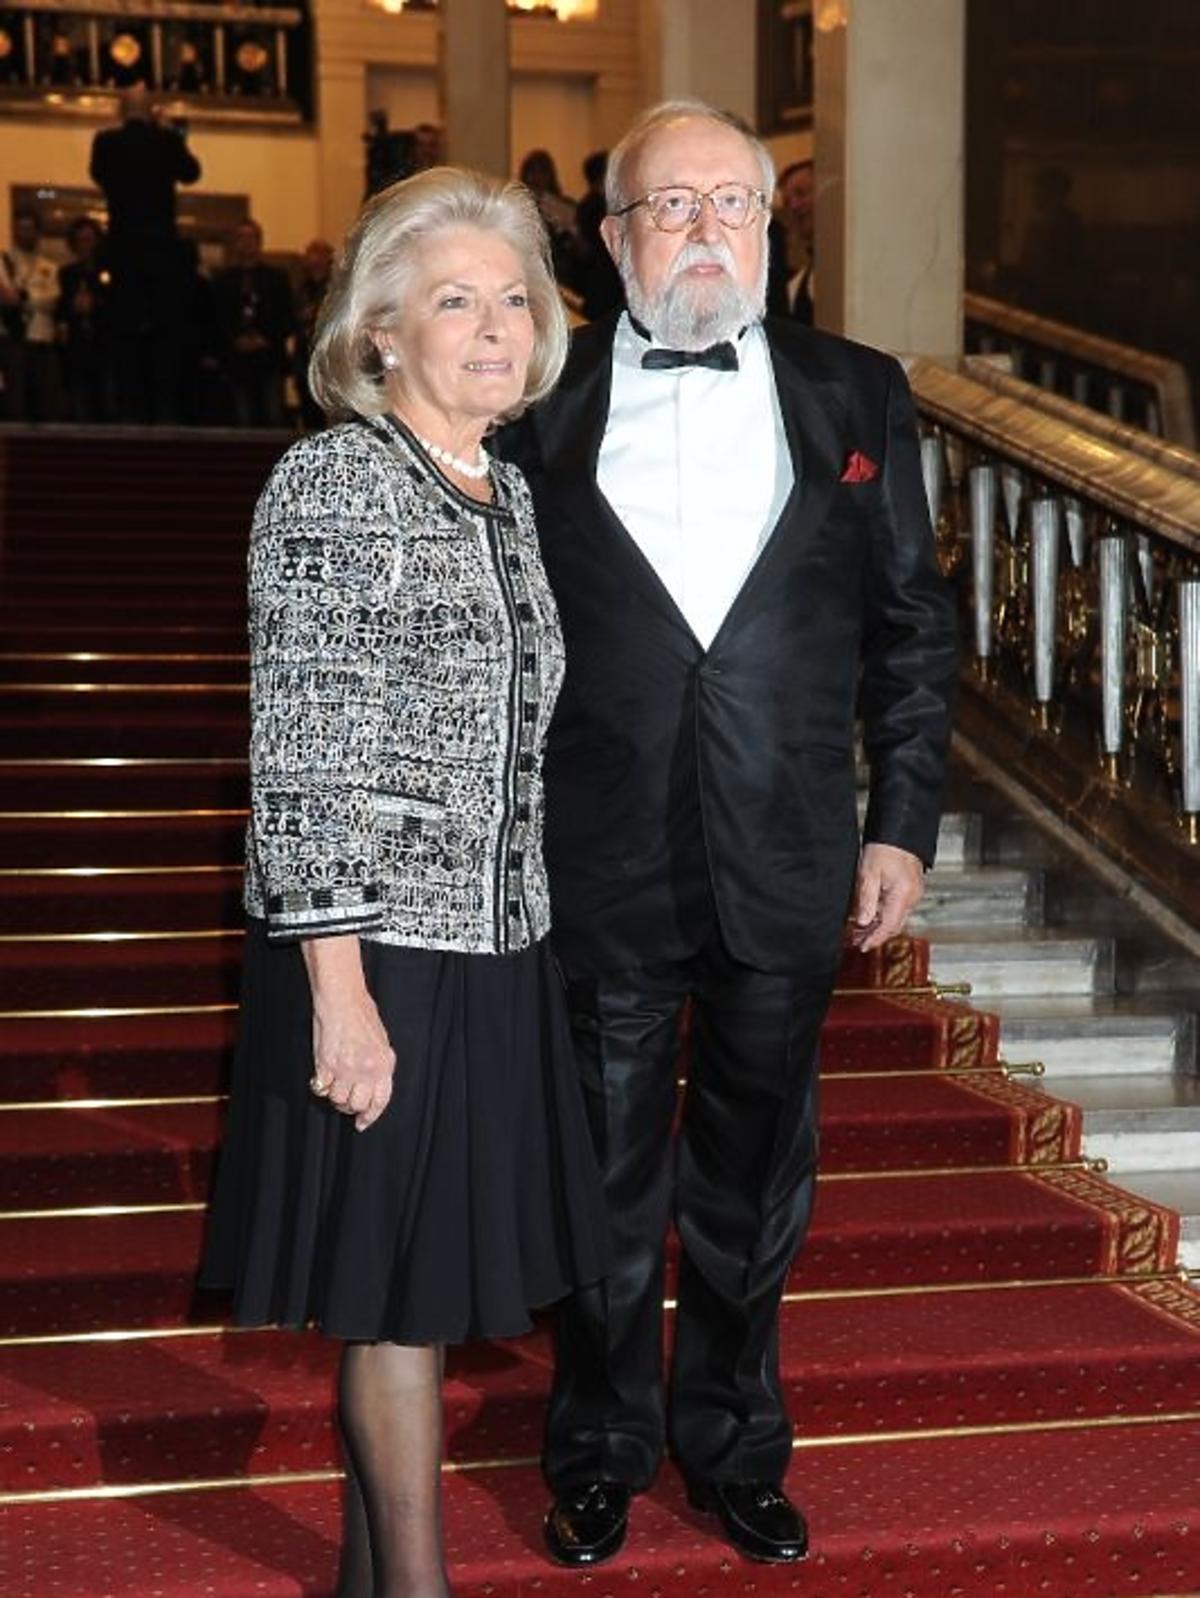 Elżbieta Penderecka i Krzysztof Penderecki na gali Paszporty Polityki 2012